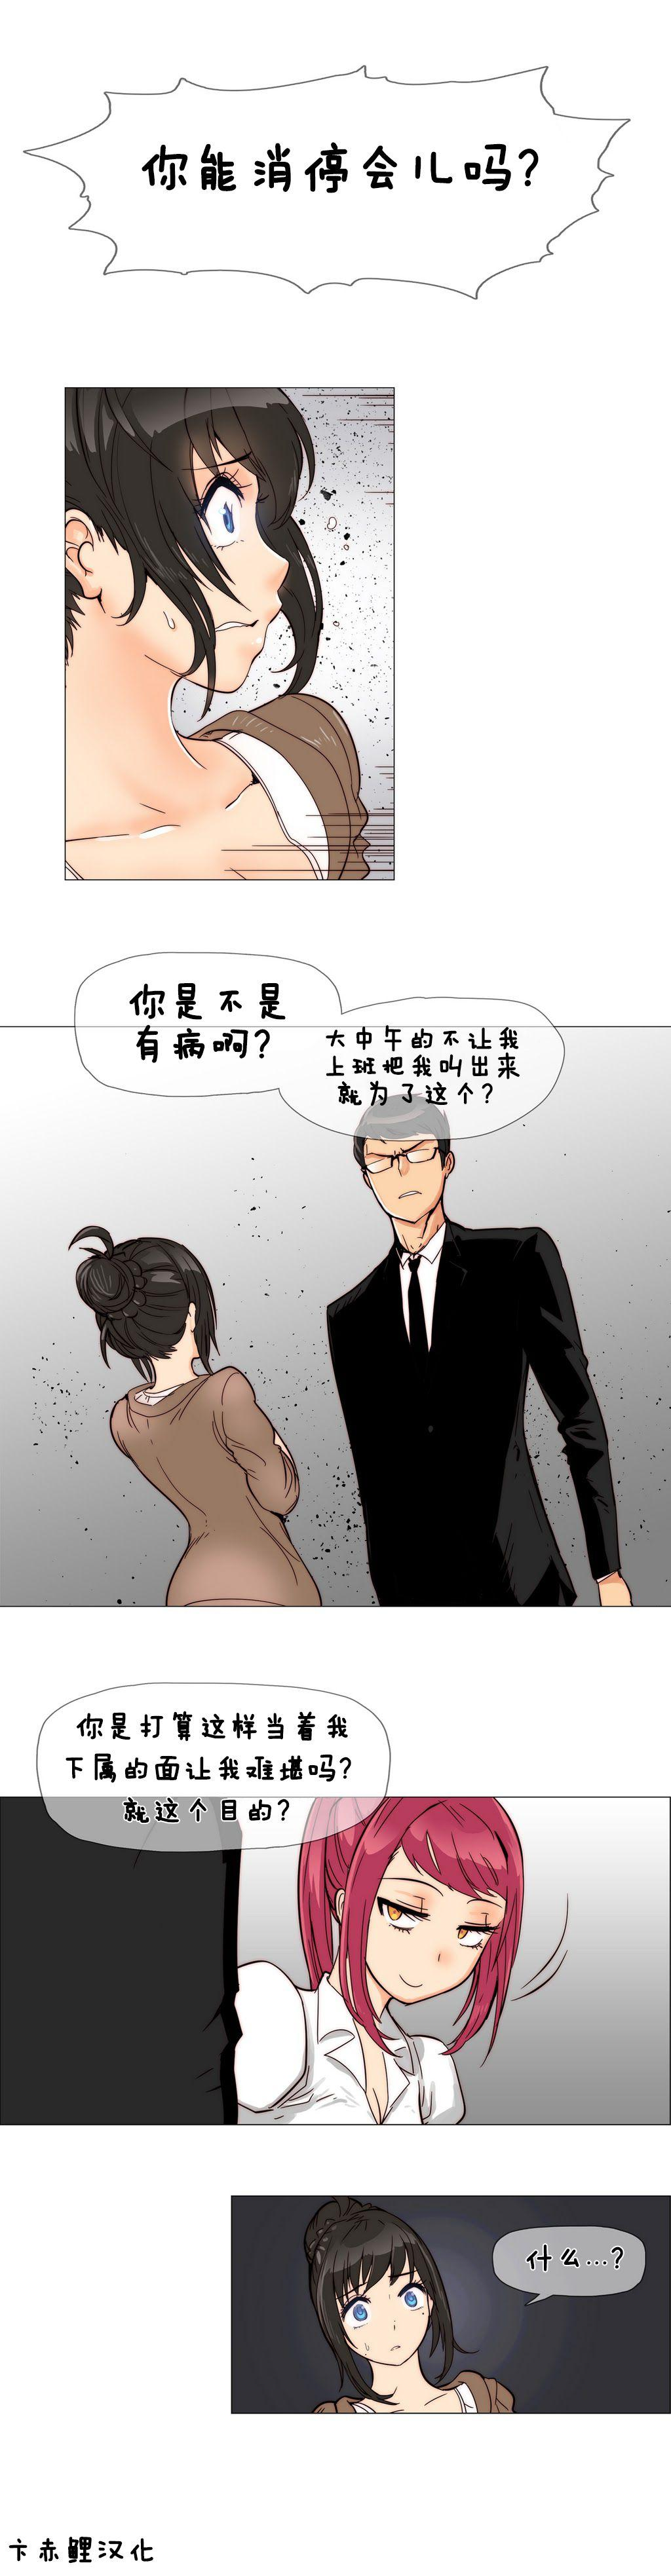 HouseHold Affairs 【卞赤鲤汉化】1~15话 96